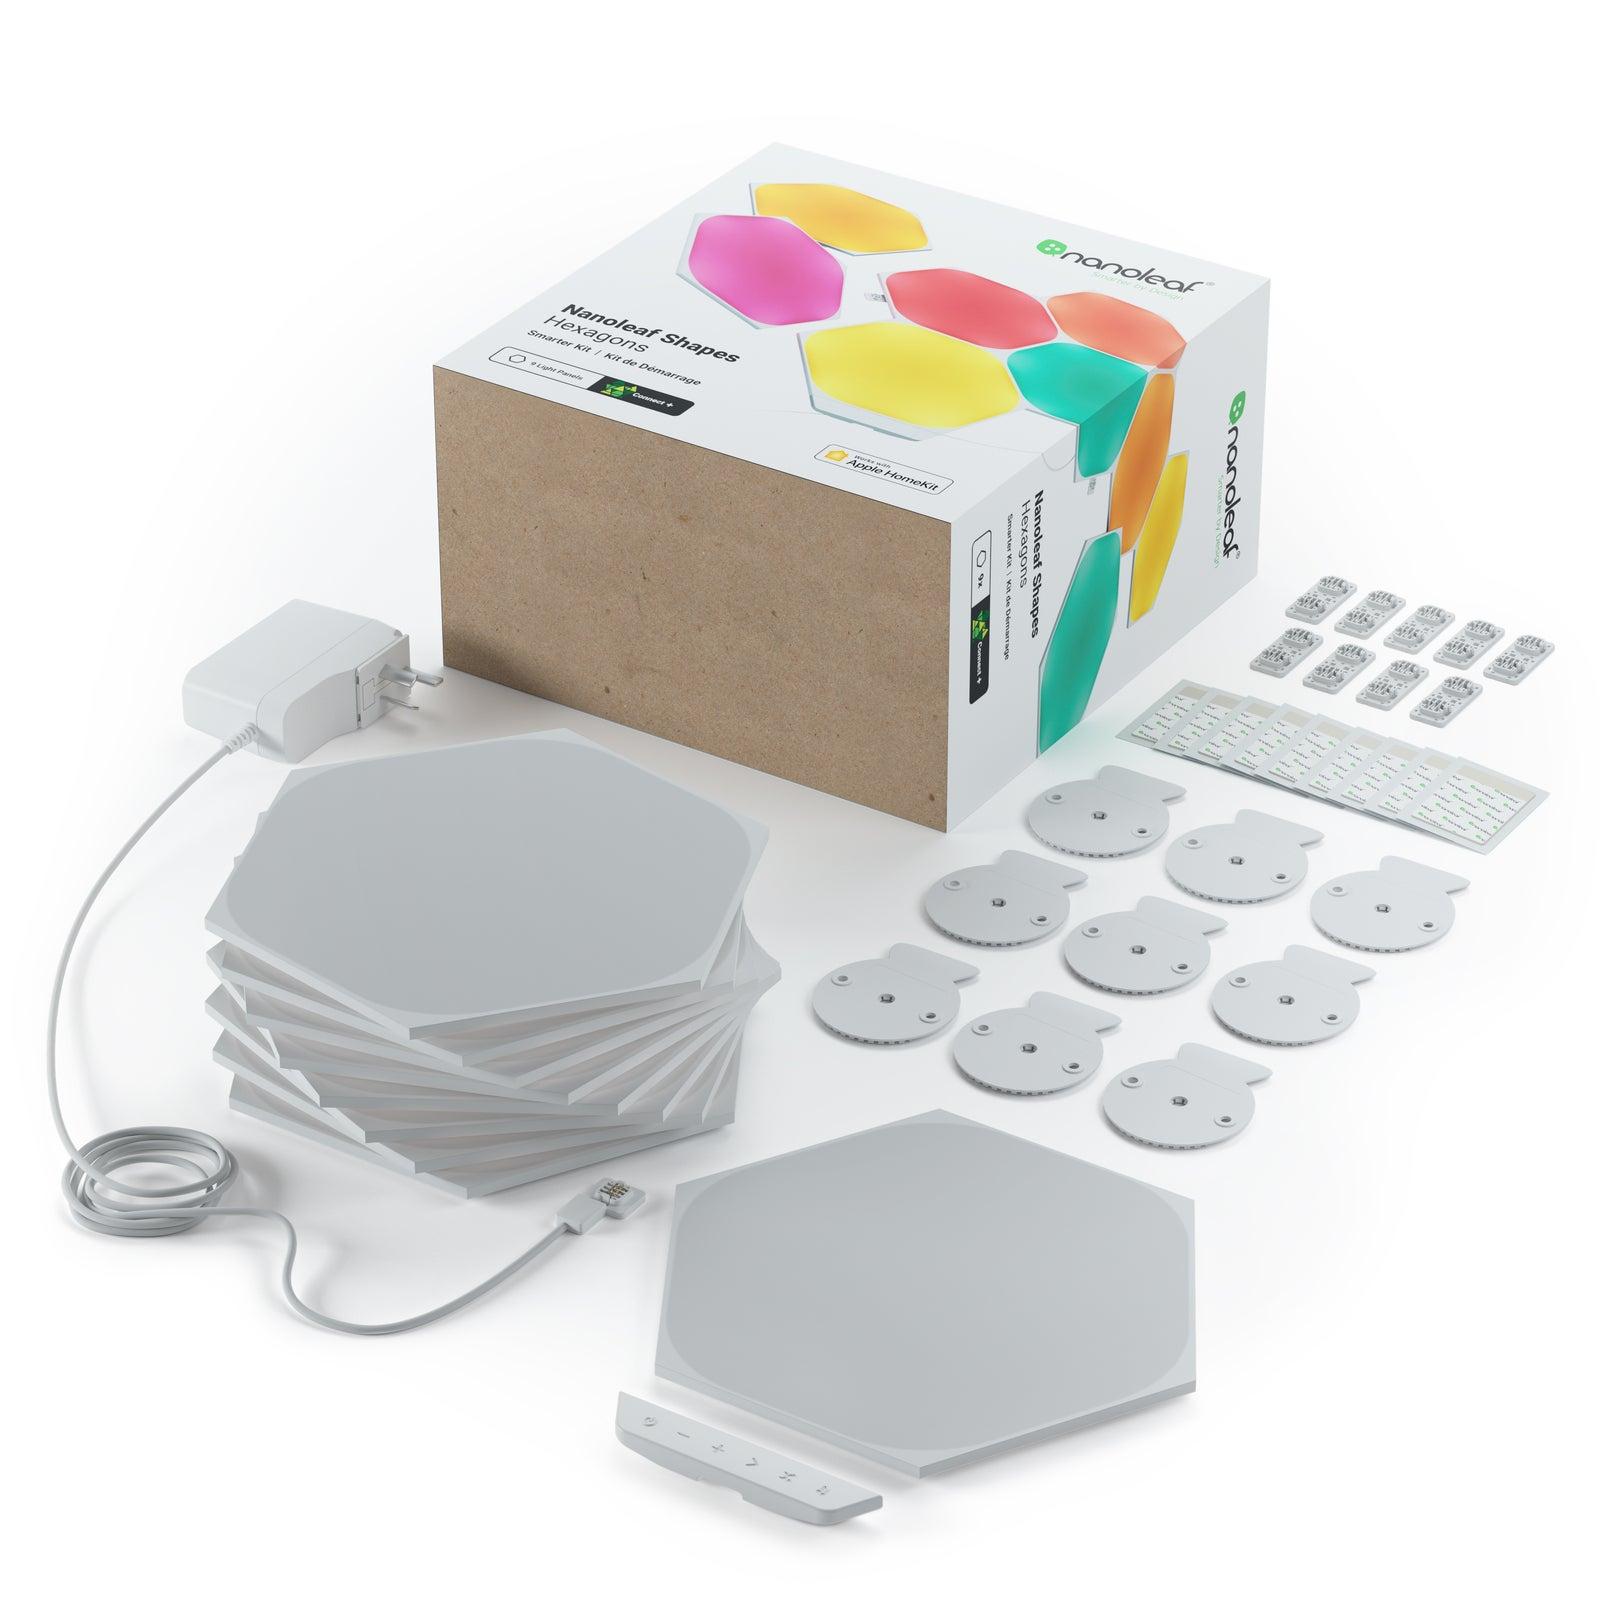 Nanoleaf Shapes Smart Light Hexagon Starter Kit w/9 Panels/Plates/Linkers